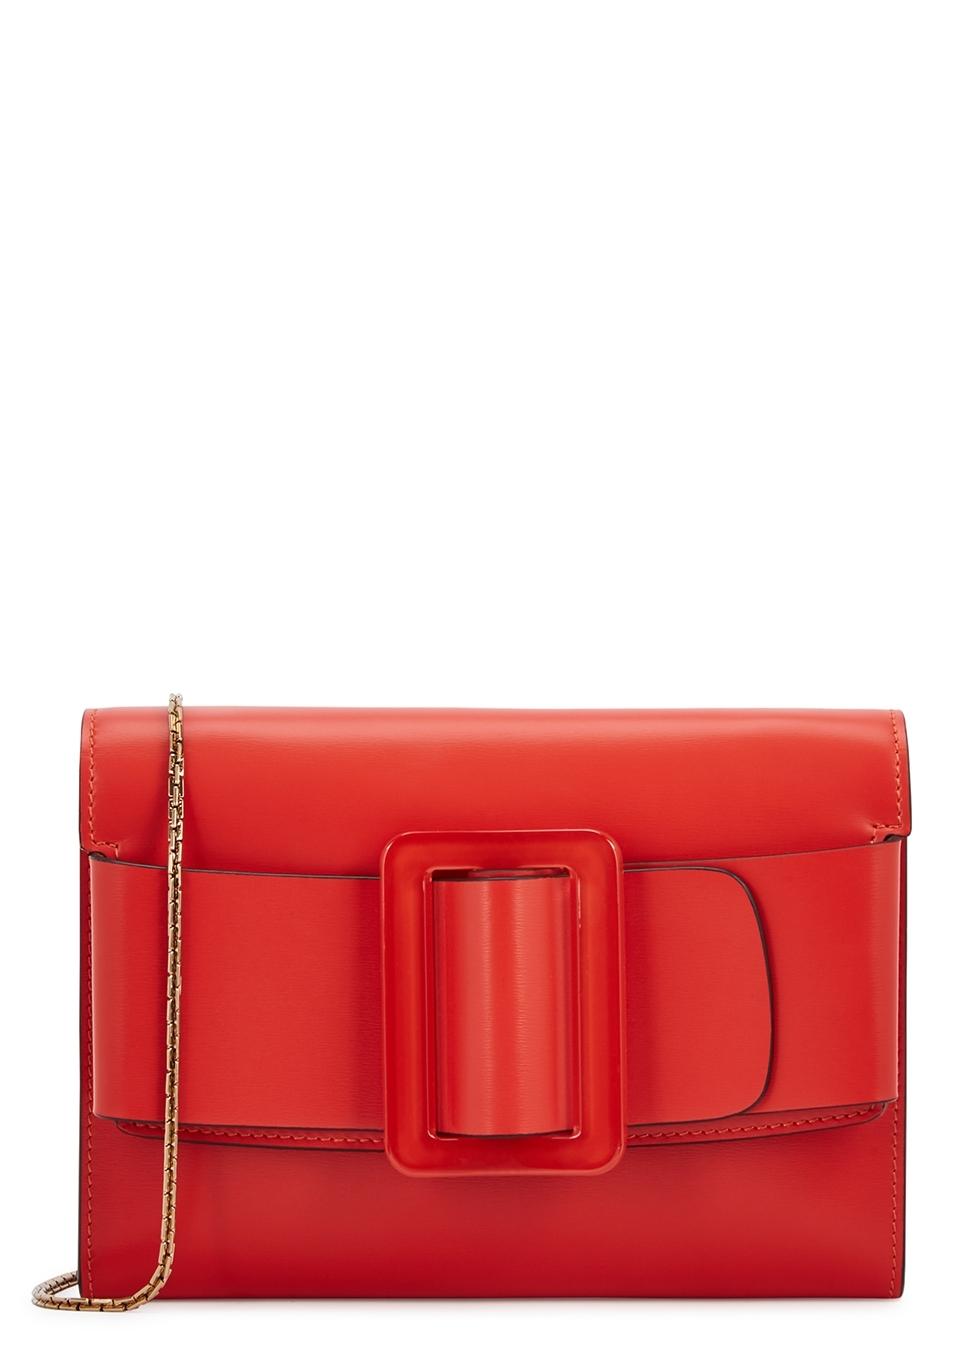 df43bbafa9a8 Designer Gifts For Her - Harvey Nichols